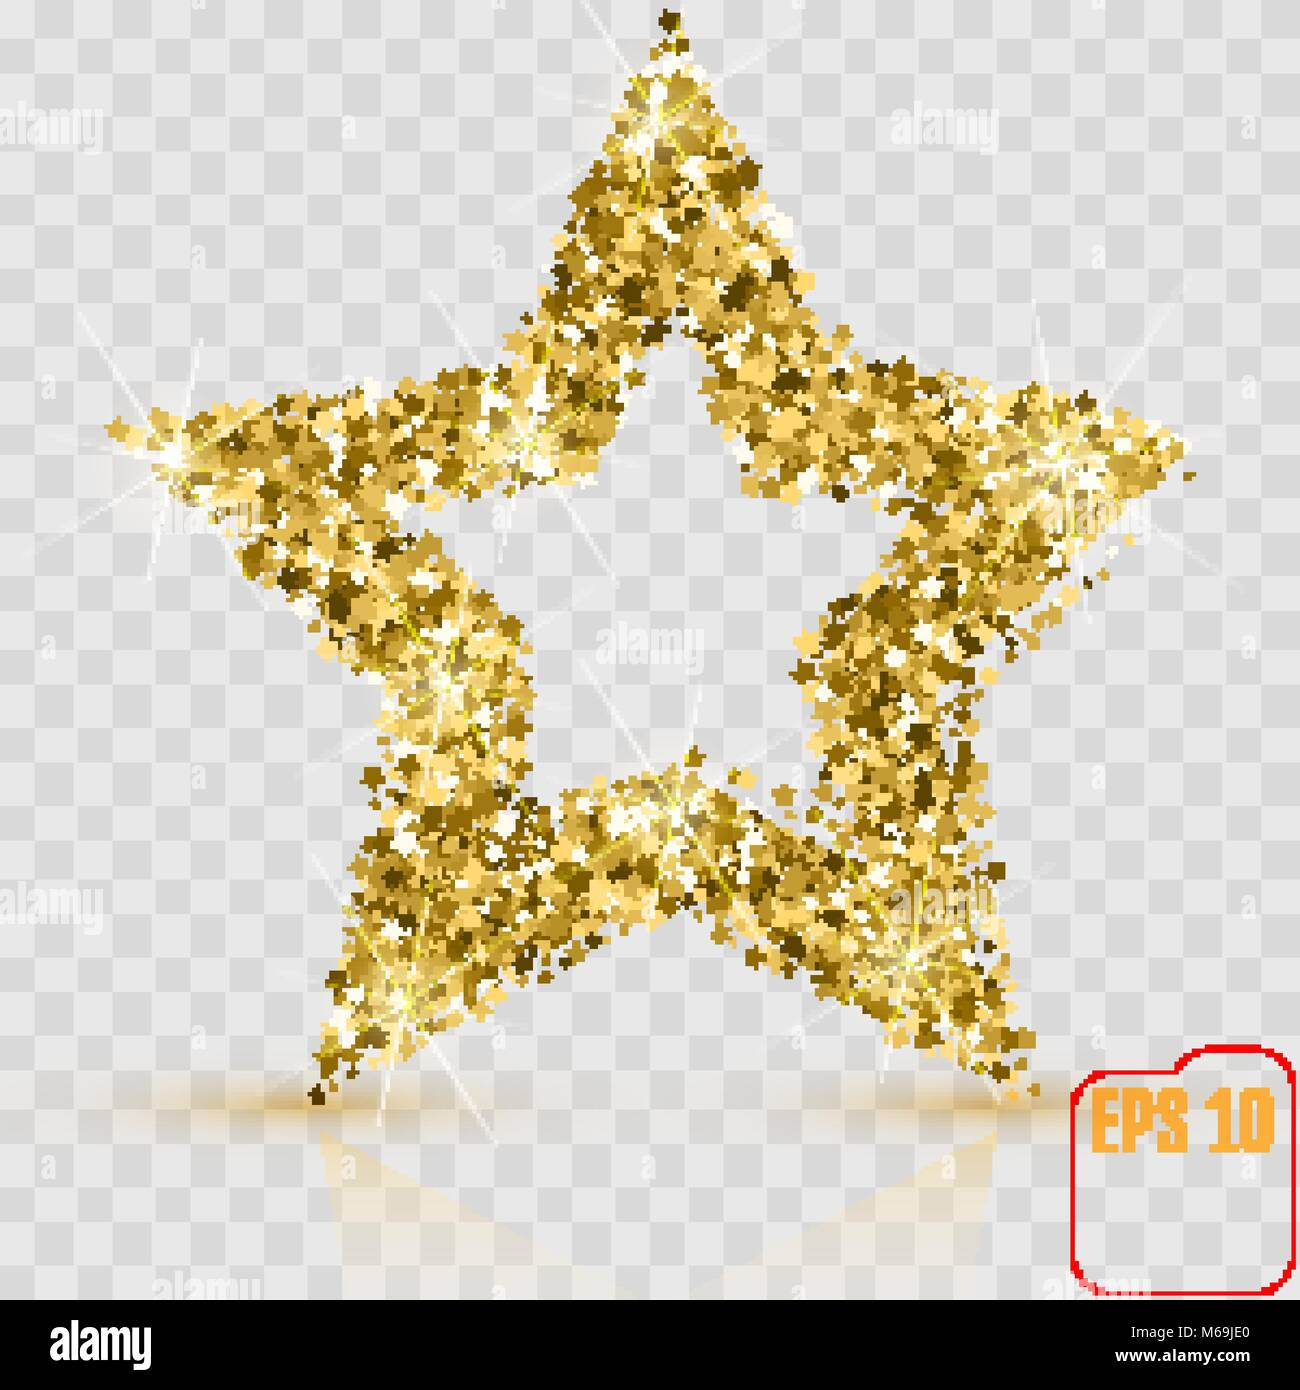 golden glitter star of many small stars vector banner on transparent